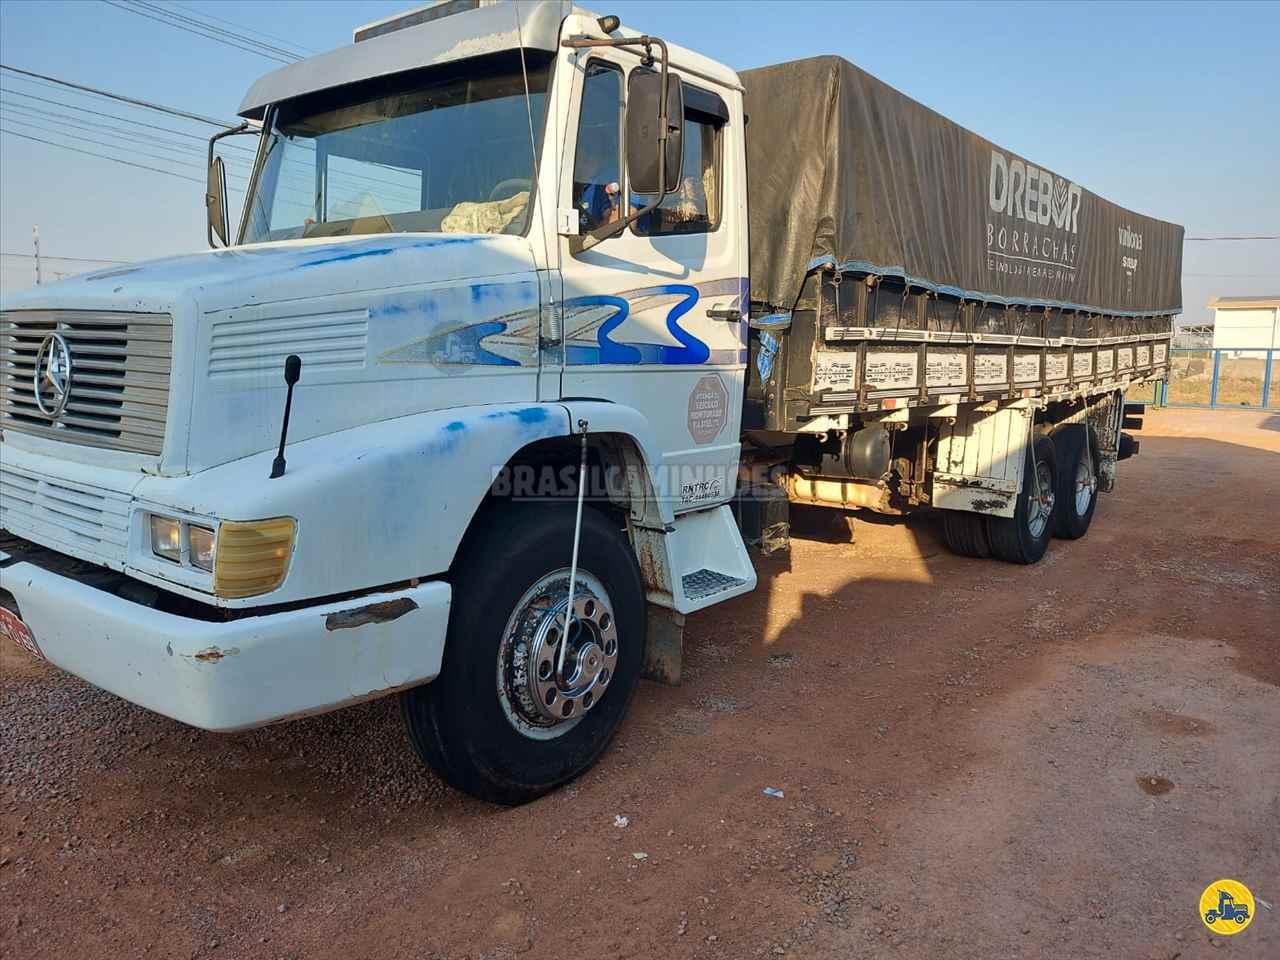 CAMINHAO MERCEDES-BENZ MB 1618 Graneleiro Truck 6x2 Brasil Caminhões Sinop SINOP MATO GROSSO MT